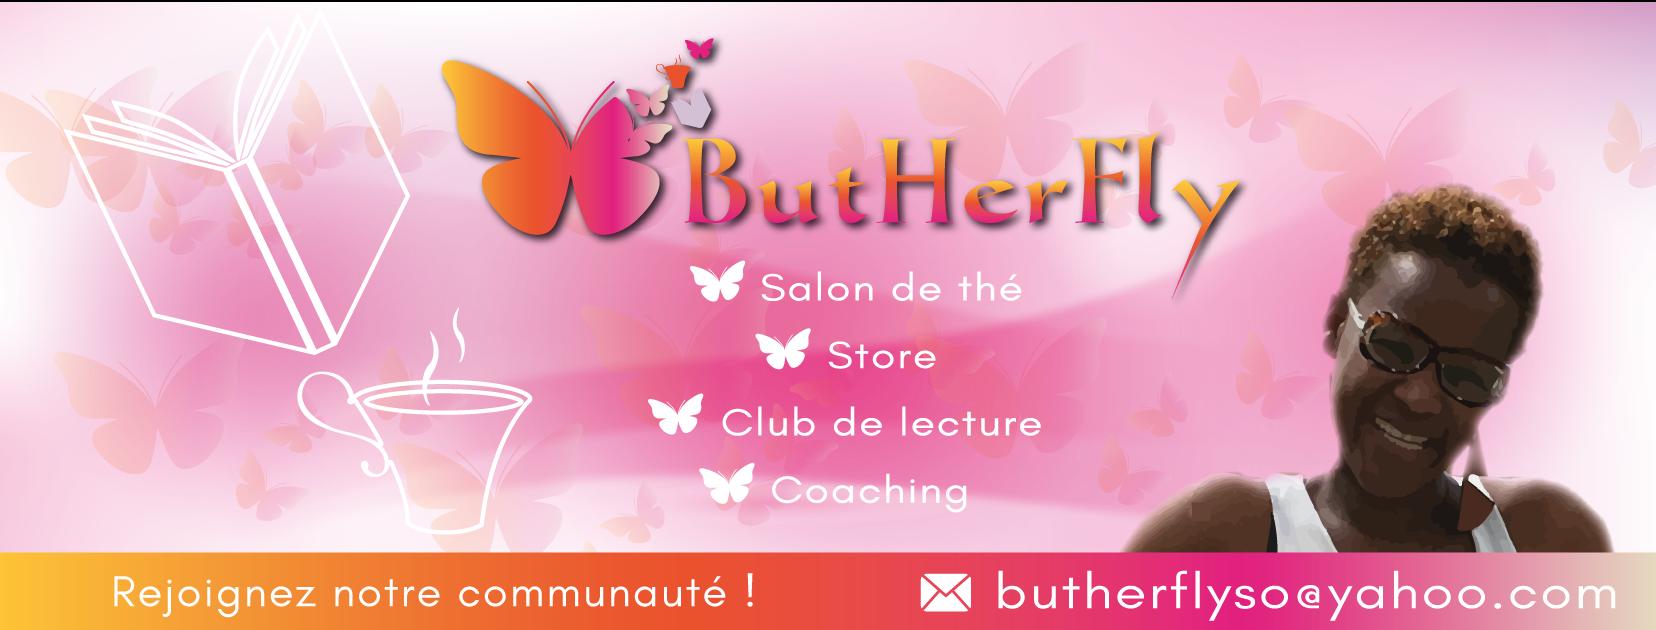 butherfliy-couverturefacebook2